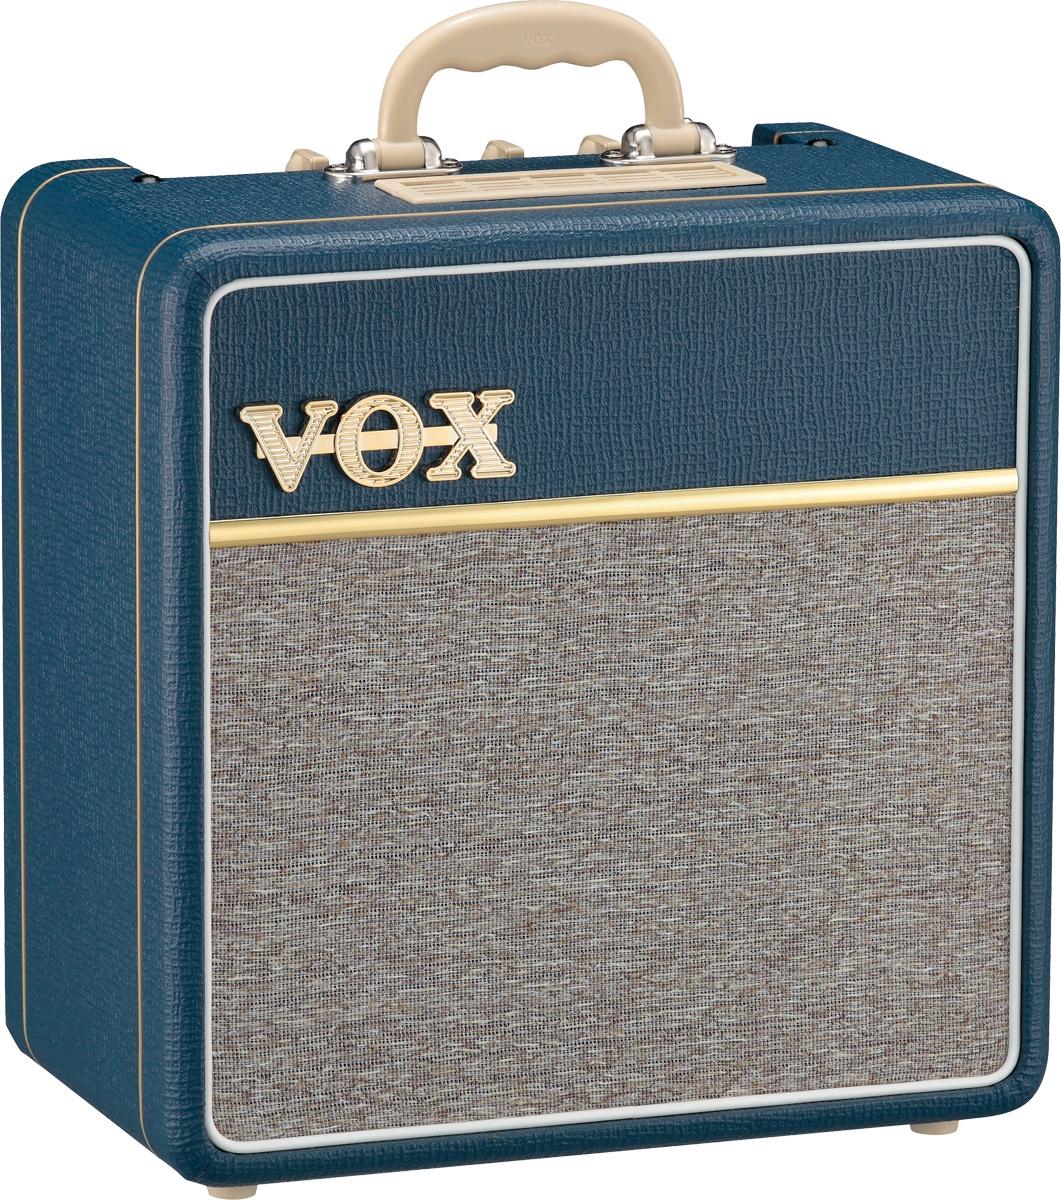 Vox Ac4c1-bl - GUITAR - Buy online - Free-scores com